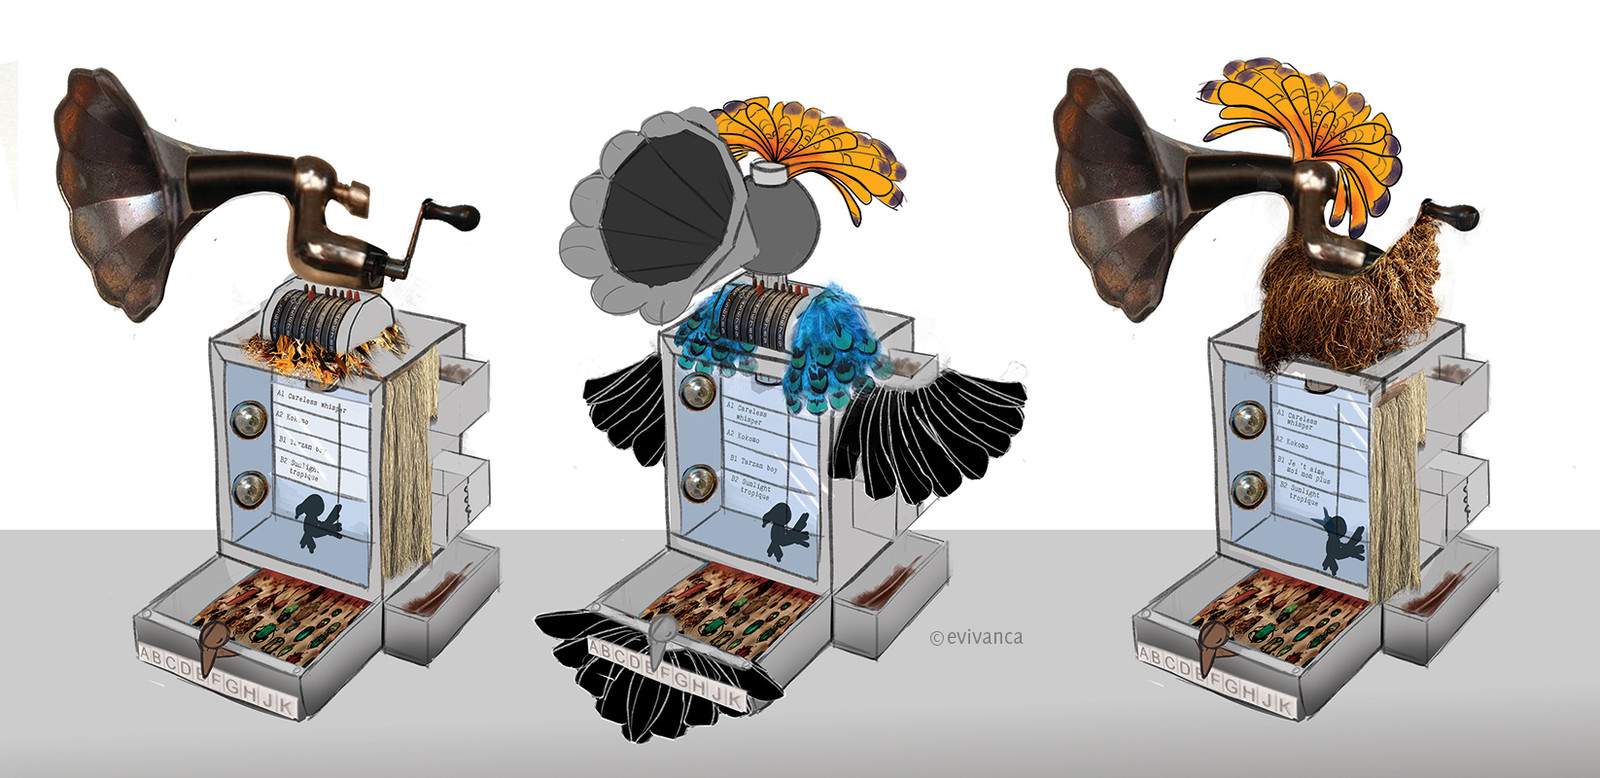 Birdiemachine - brainstorming